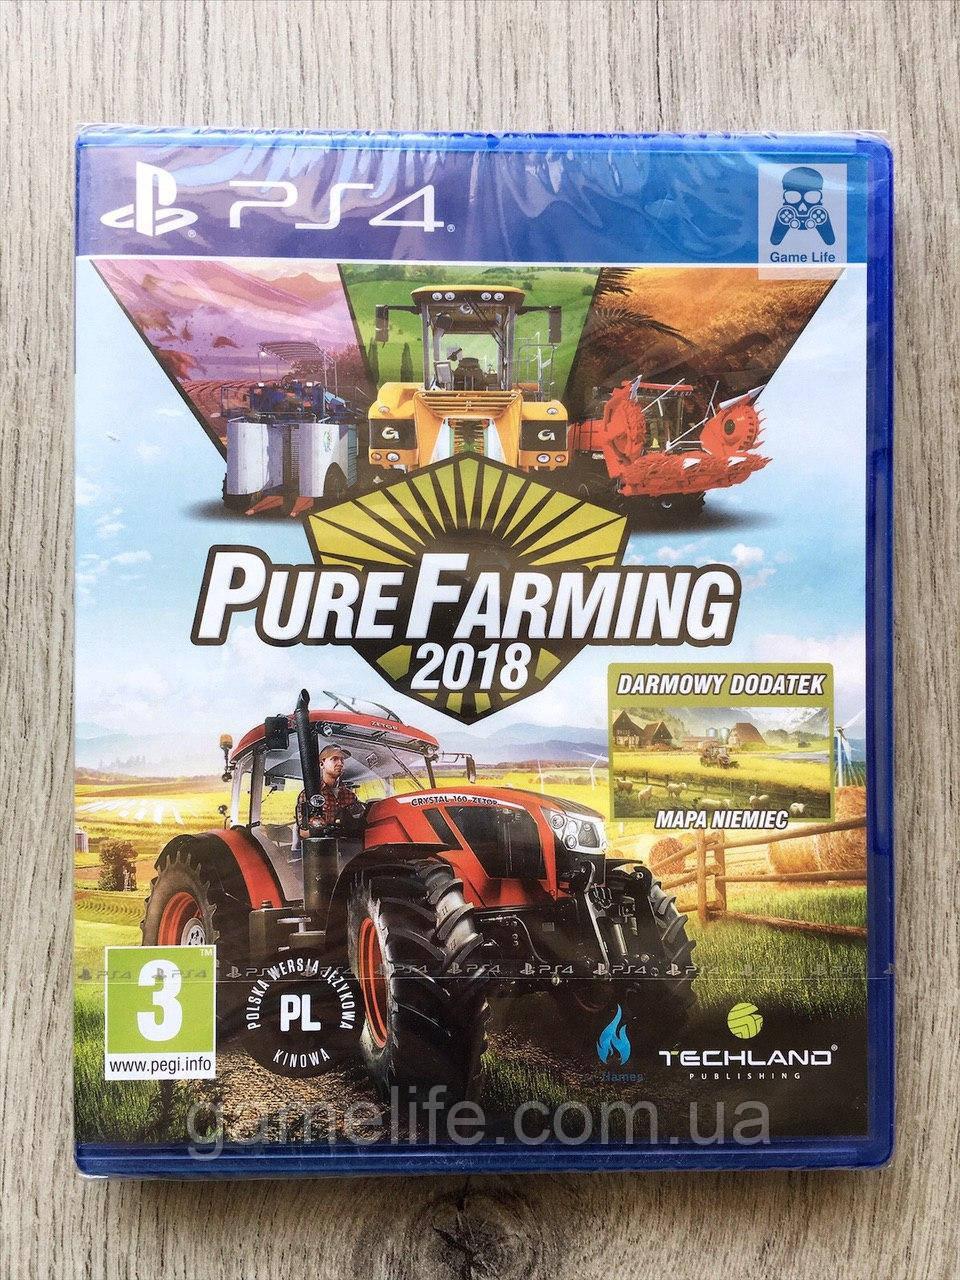 Pure Farming 2018 (англ.) PS4